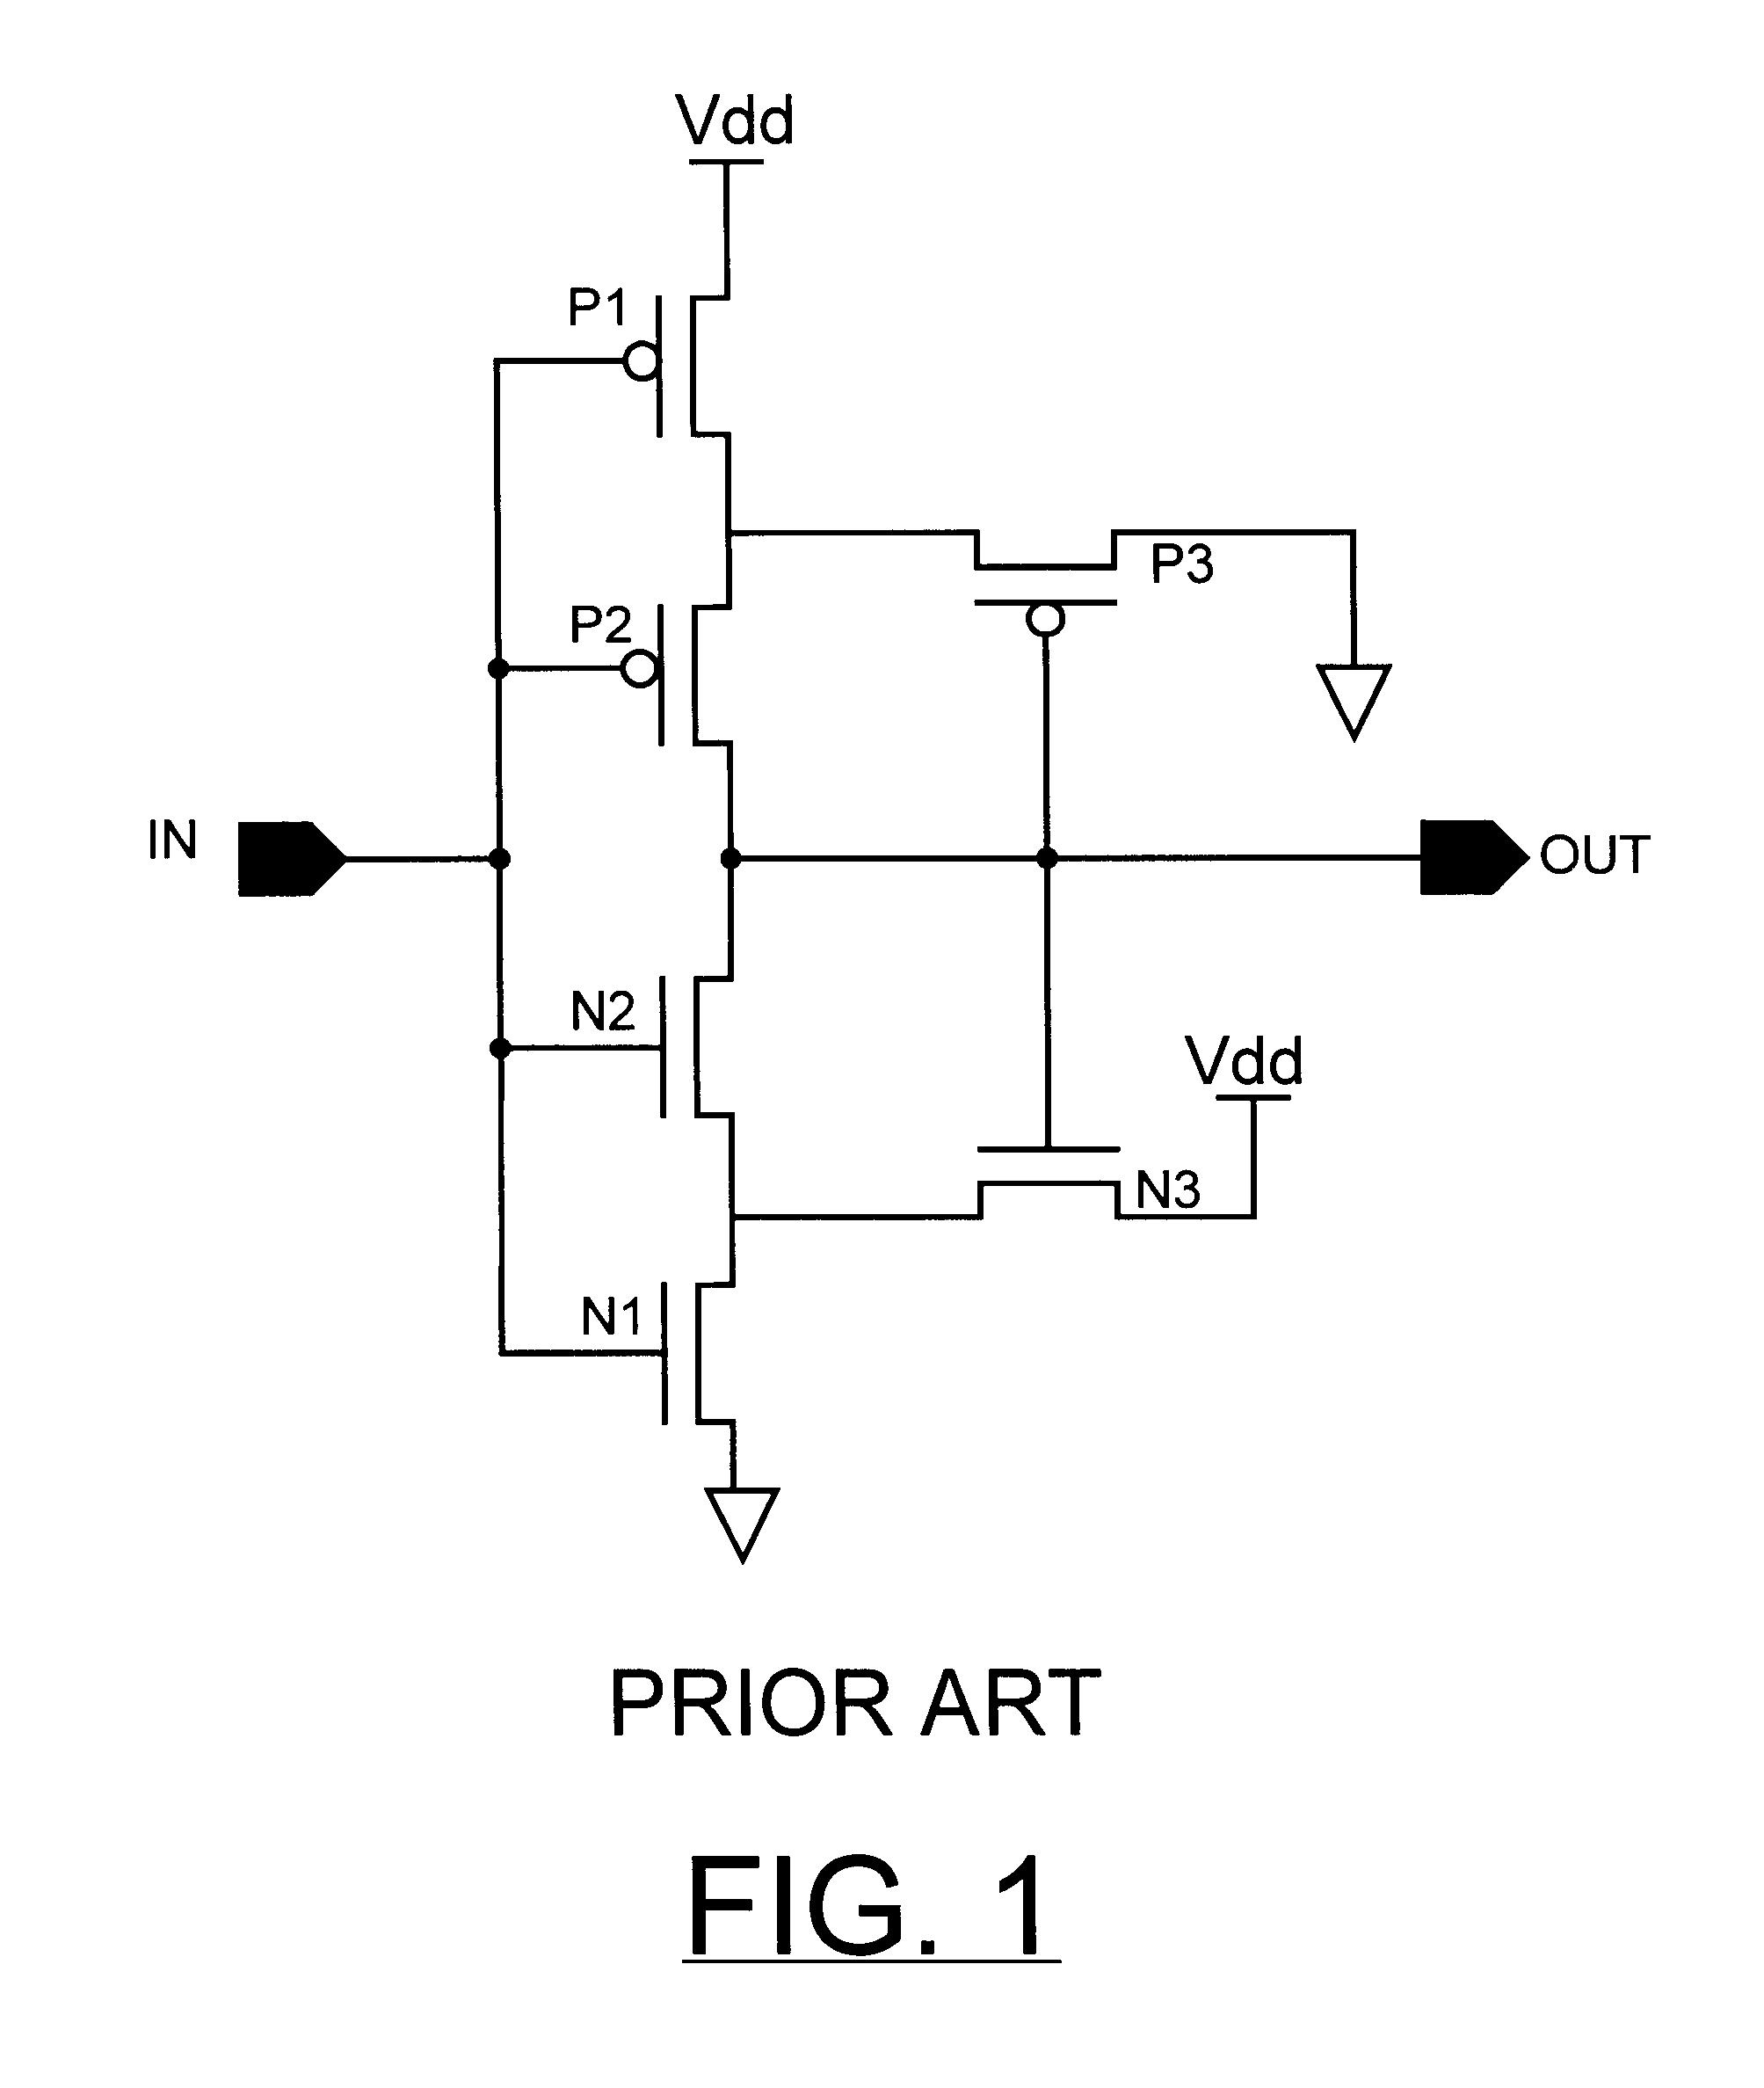 schmitt trigger circuit diagram and schematic